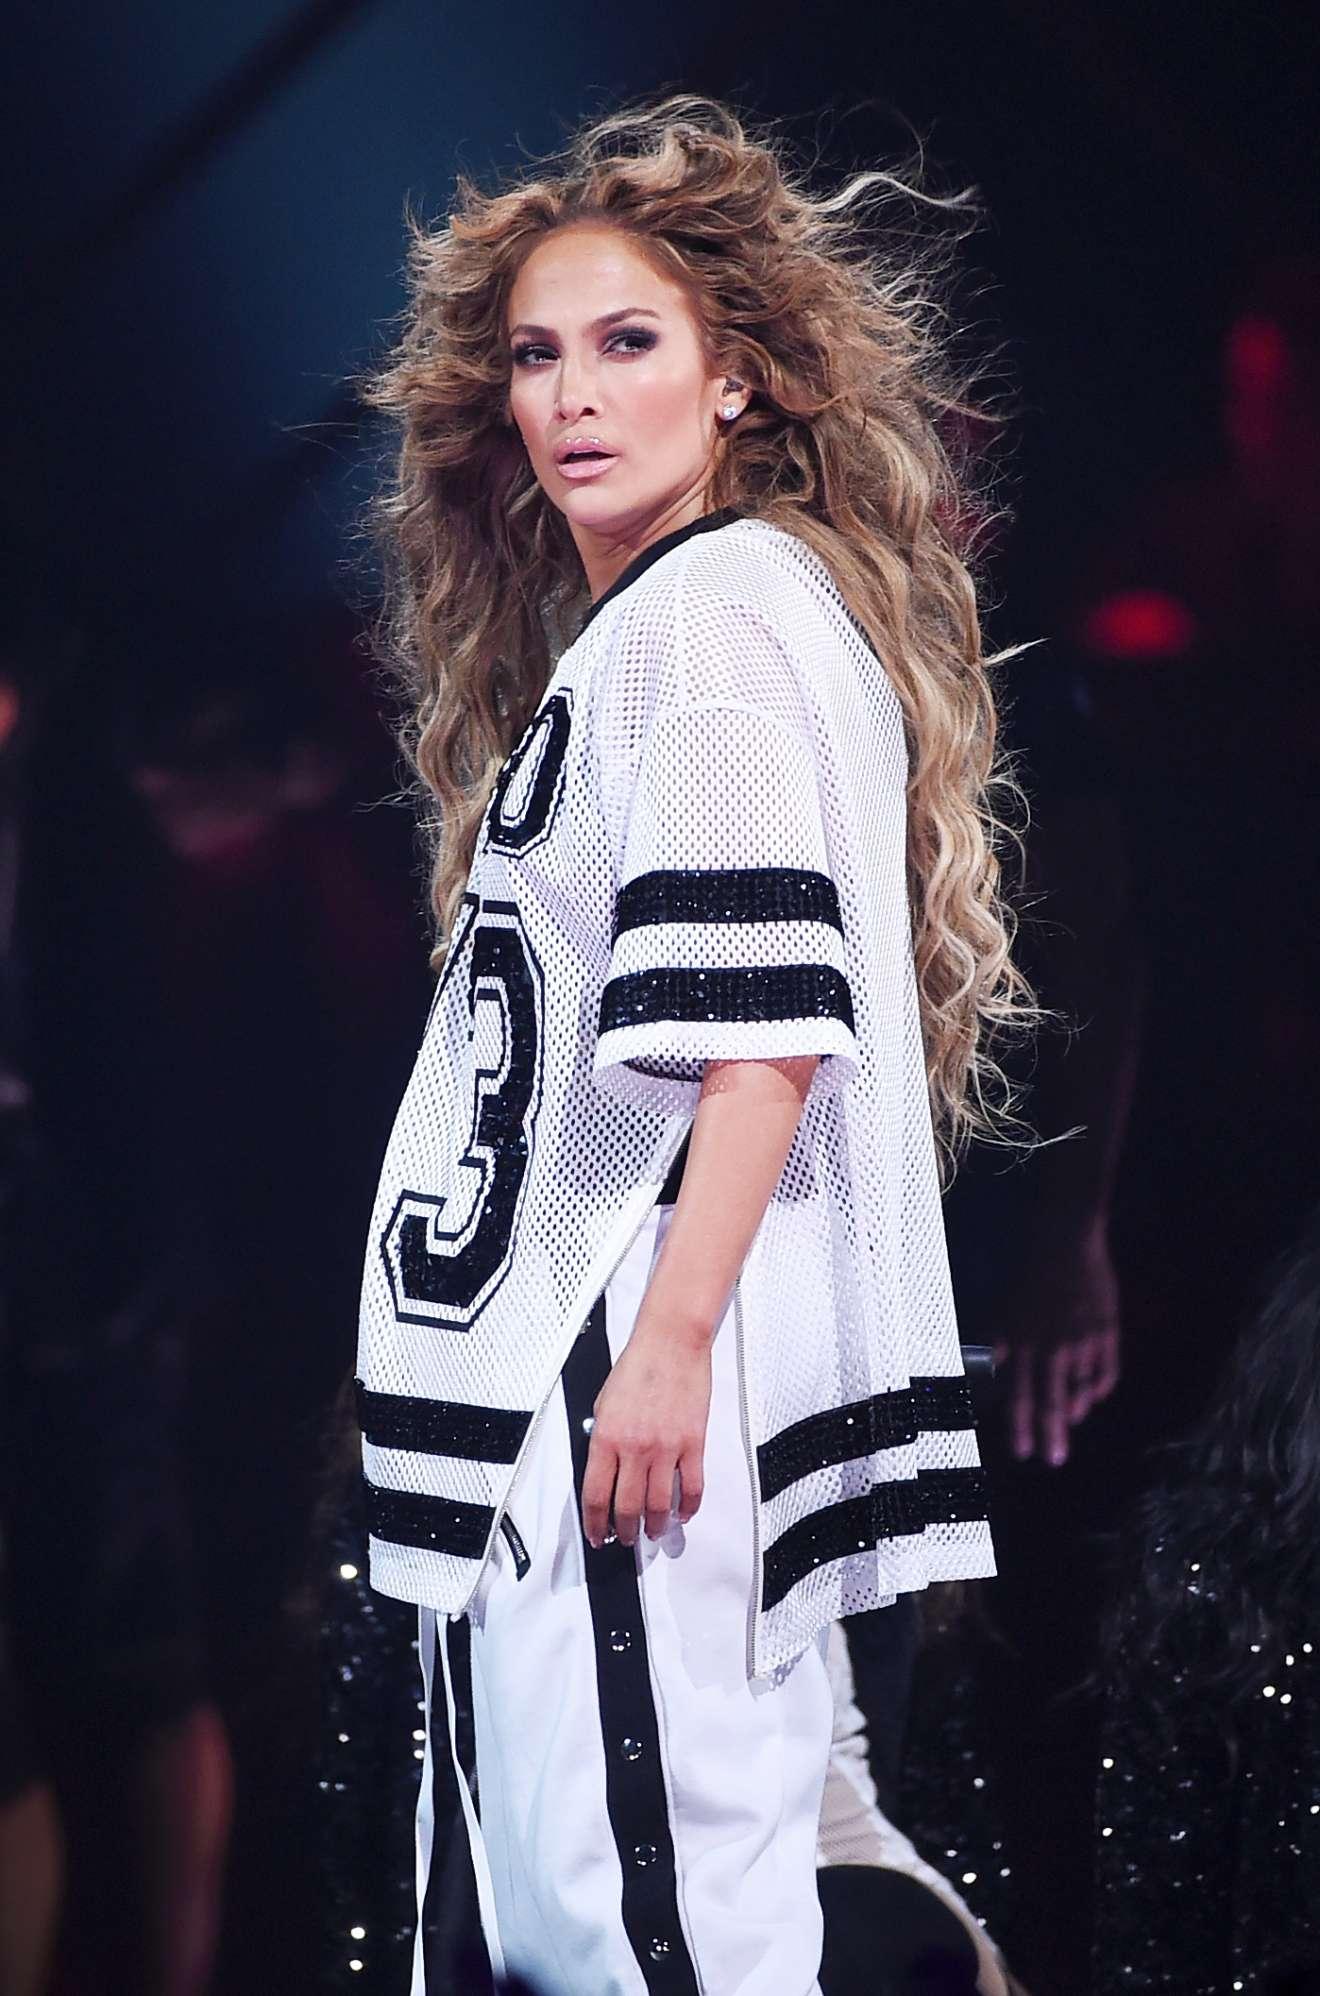 Jennifer Lopez 2018 : Jennifer Lopez: 2018 DIRECTV NOW Super Saturday Night Concert in Minneapolis-20